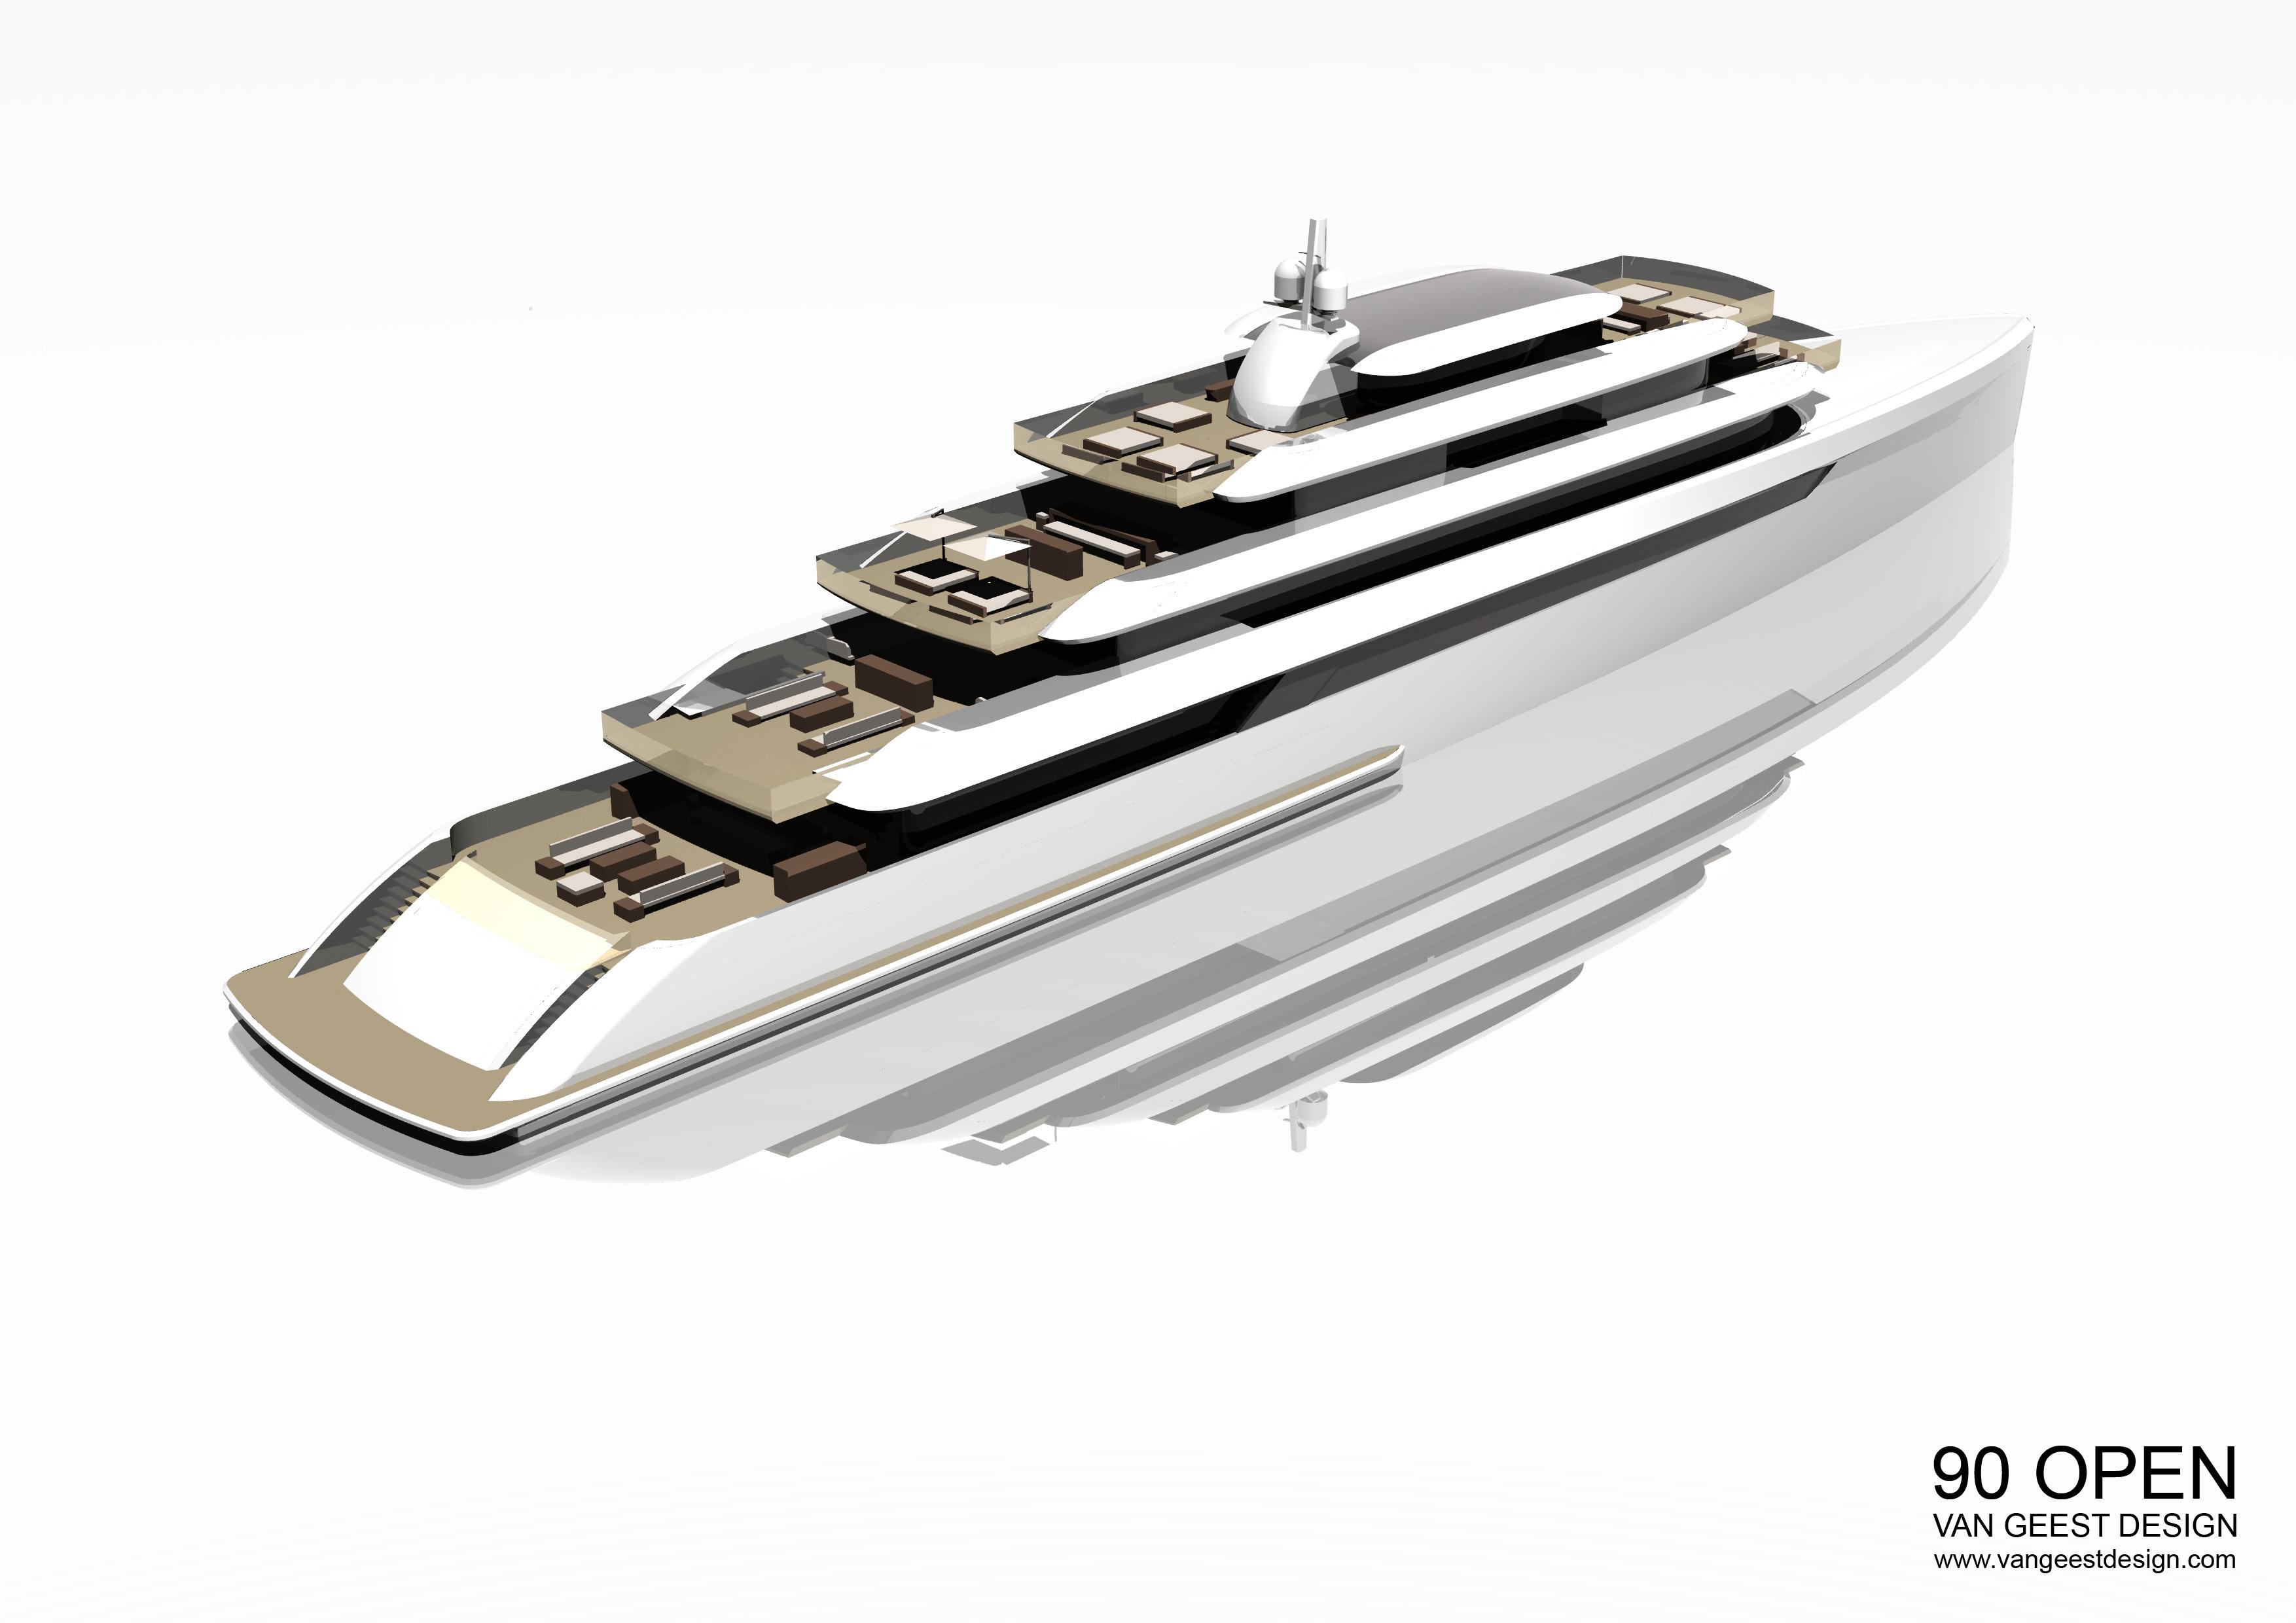 VGD 90M Open Yacht Concept by Van Geest Design — Yacht